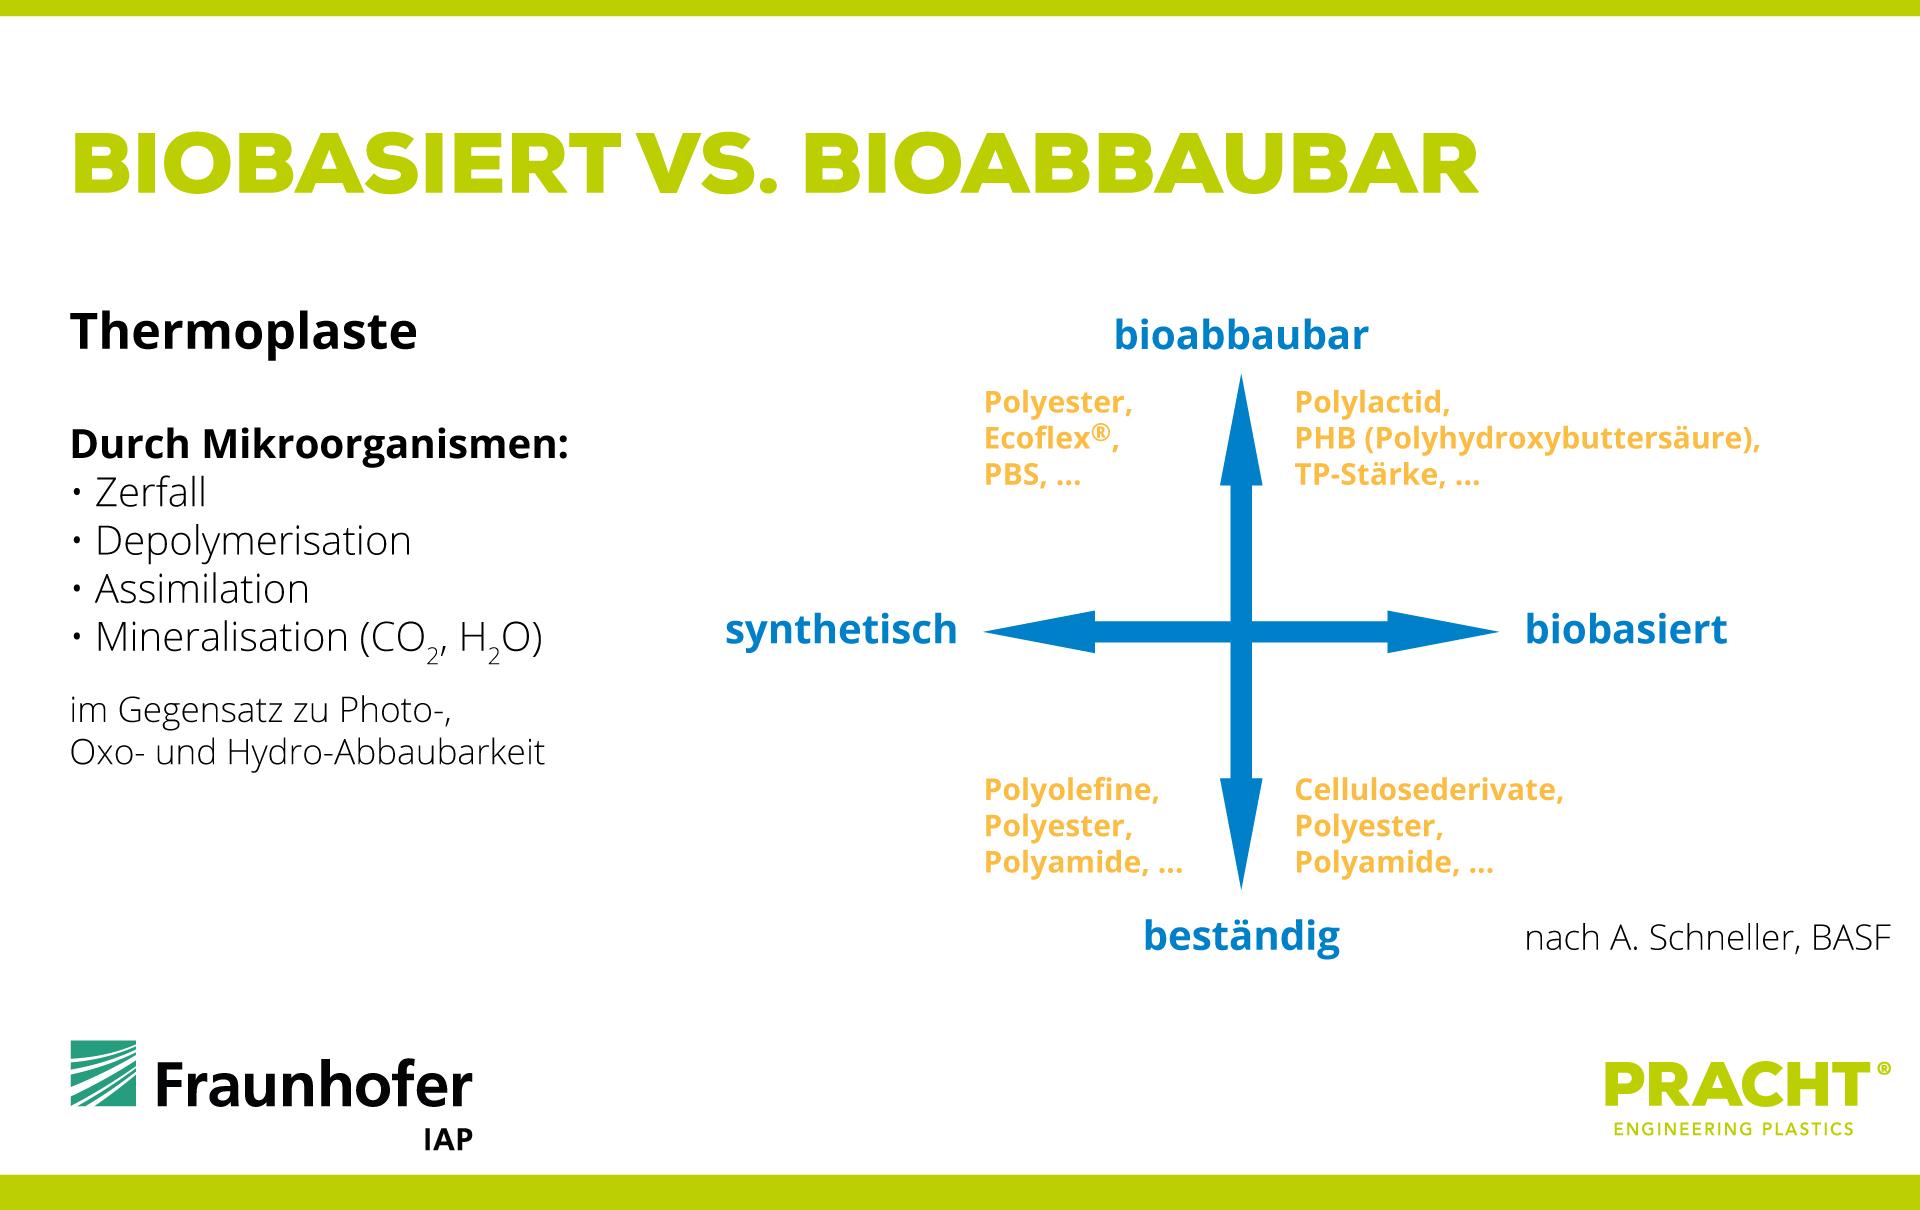 Abbildung 2 : Biopolymere biobasiert vs. bioabbaubar, Quelle IAP Fraunhofer, Potsdam-G